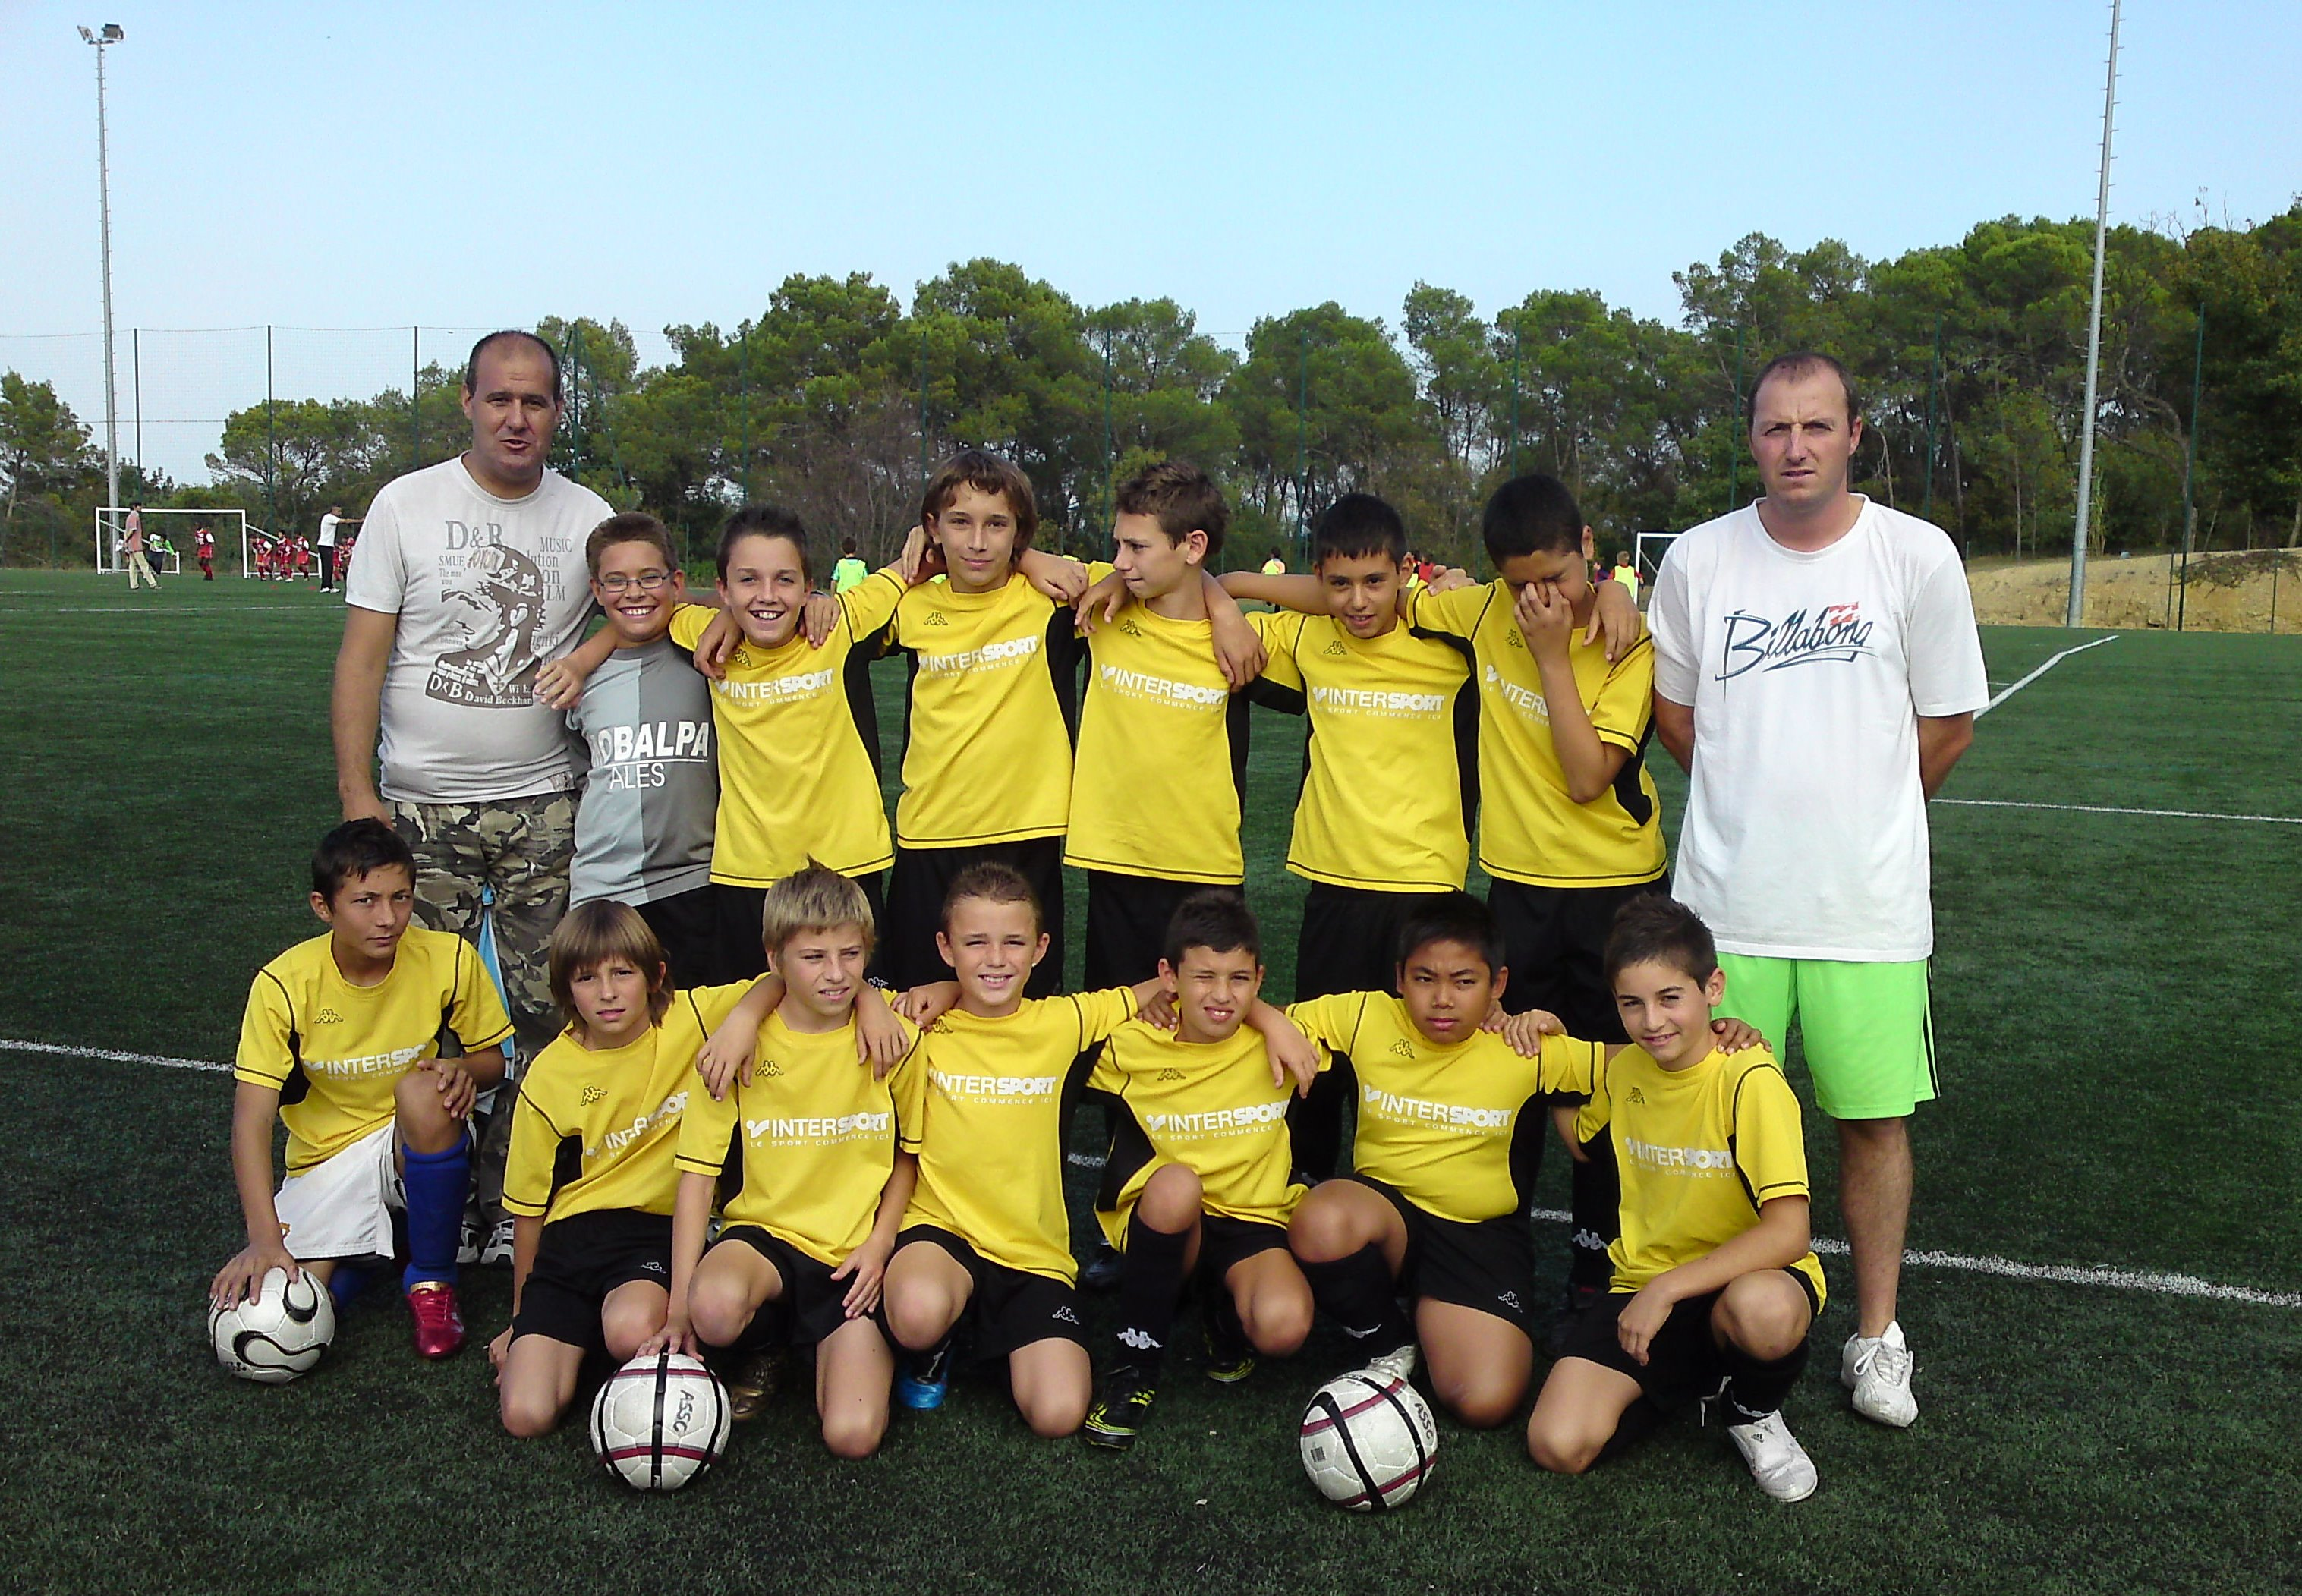 Franck U 13